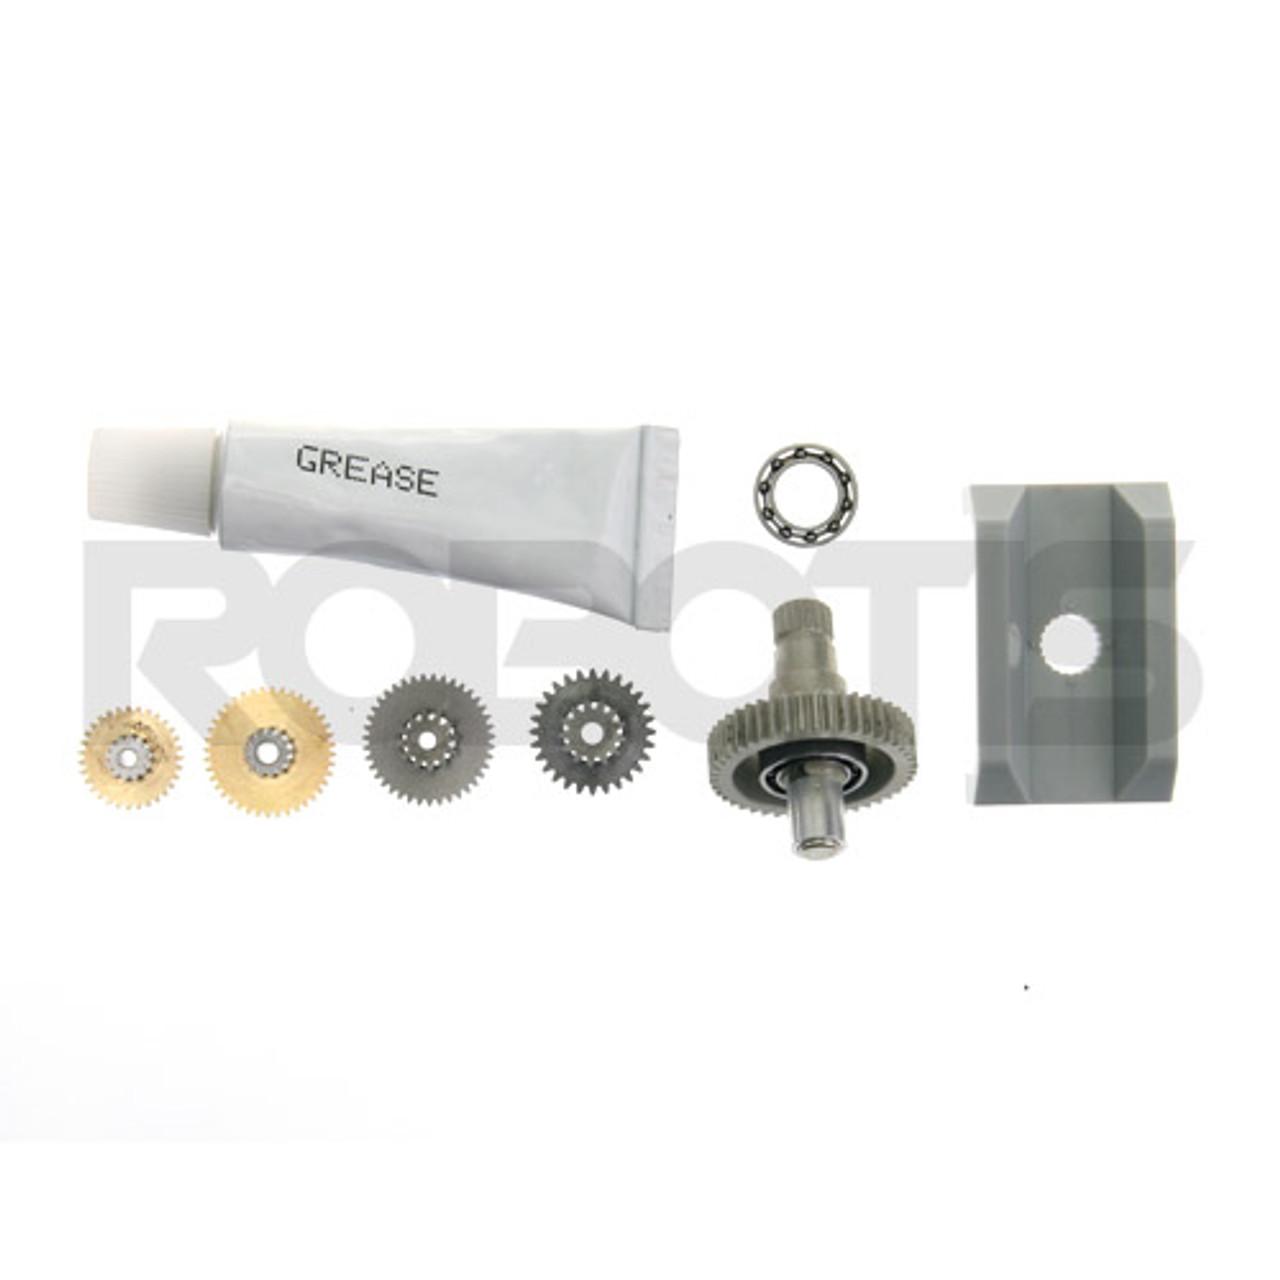 MX-28 Gear/Bearing Set